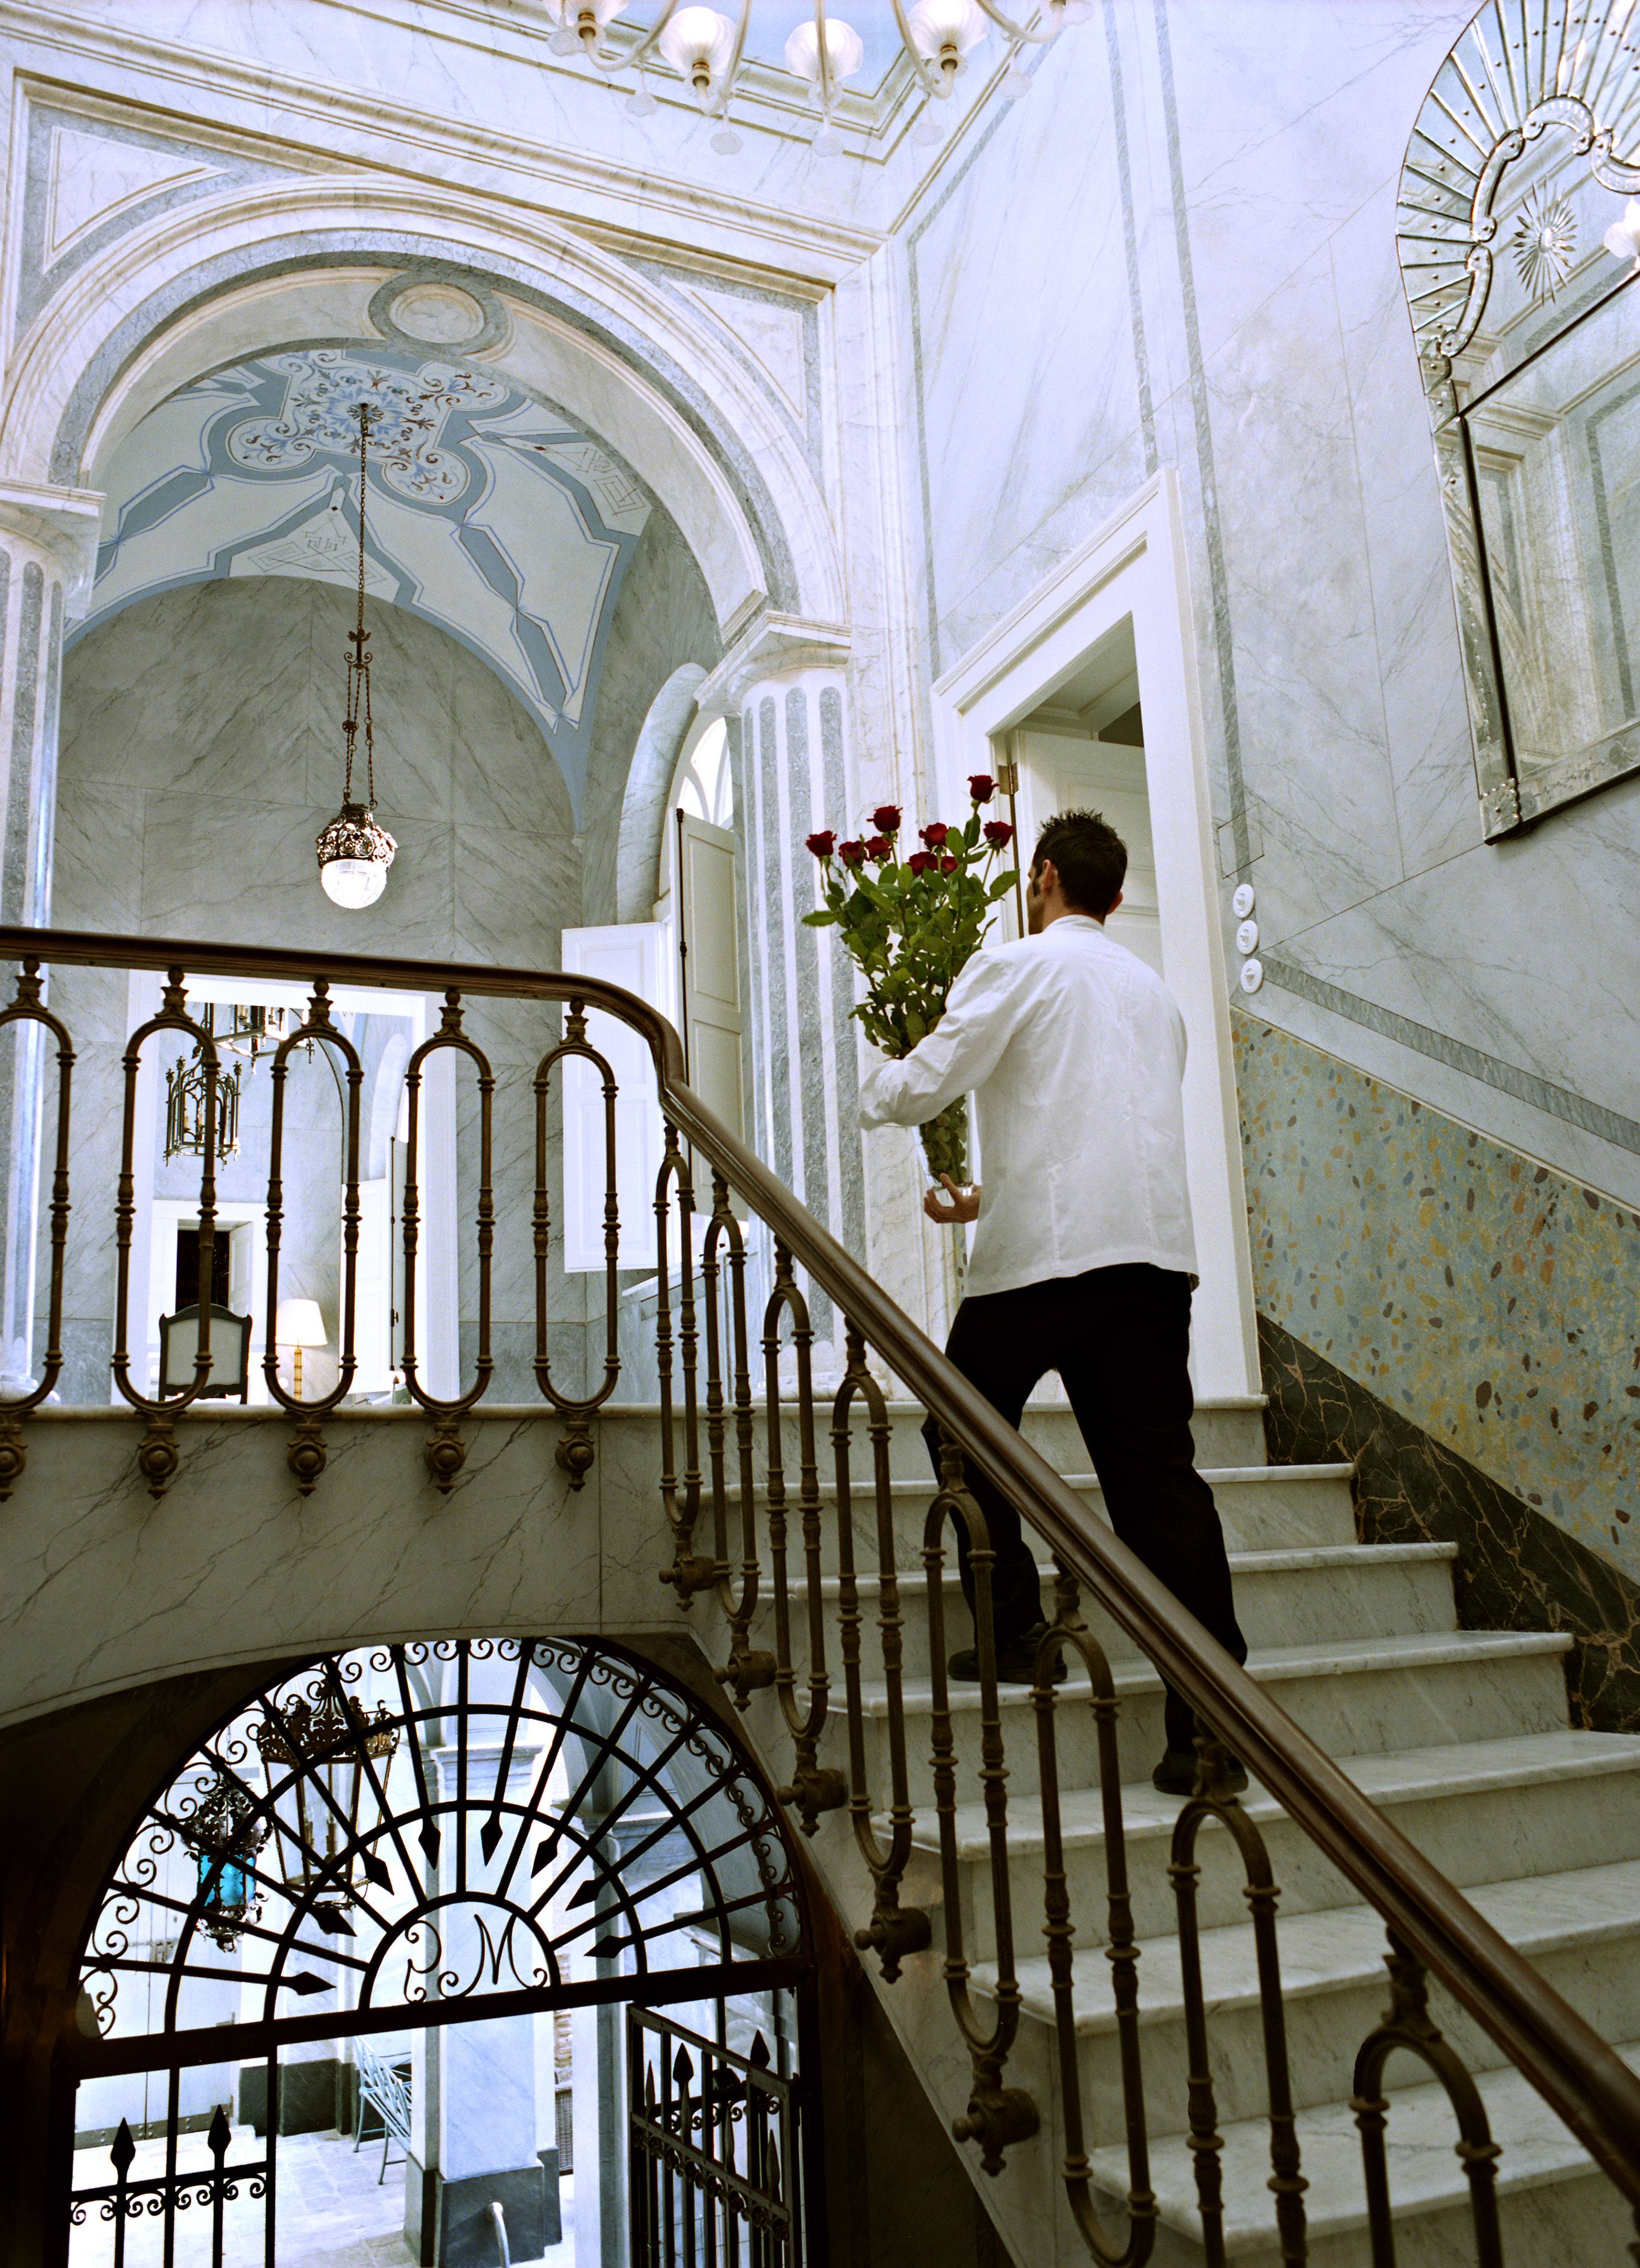 Hotels Palazzo (7)